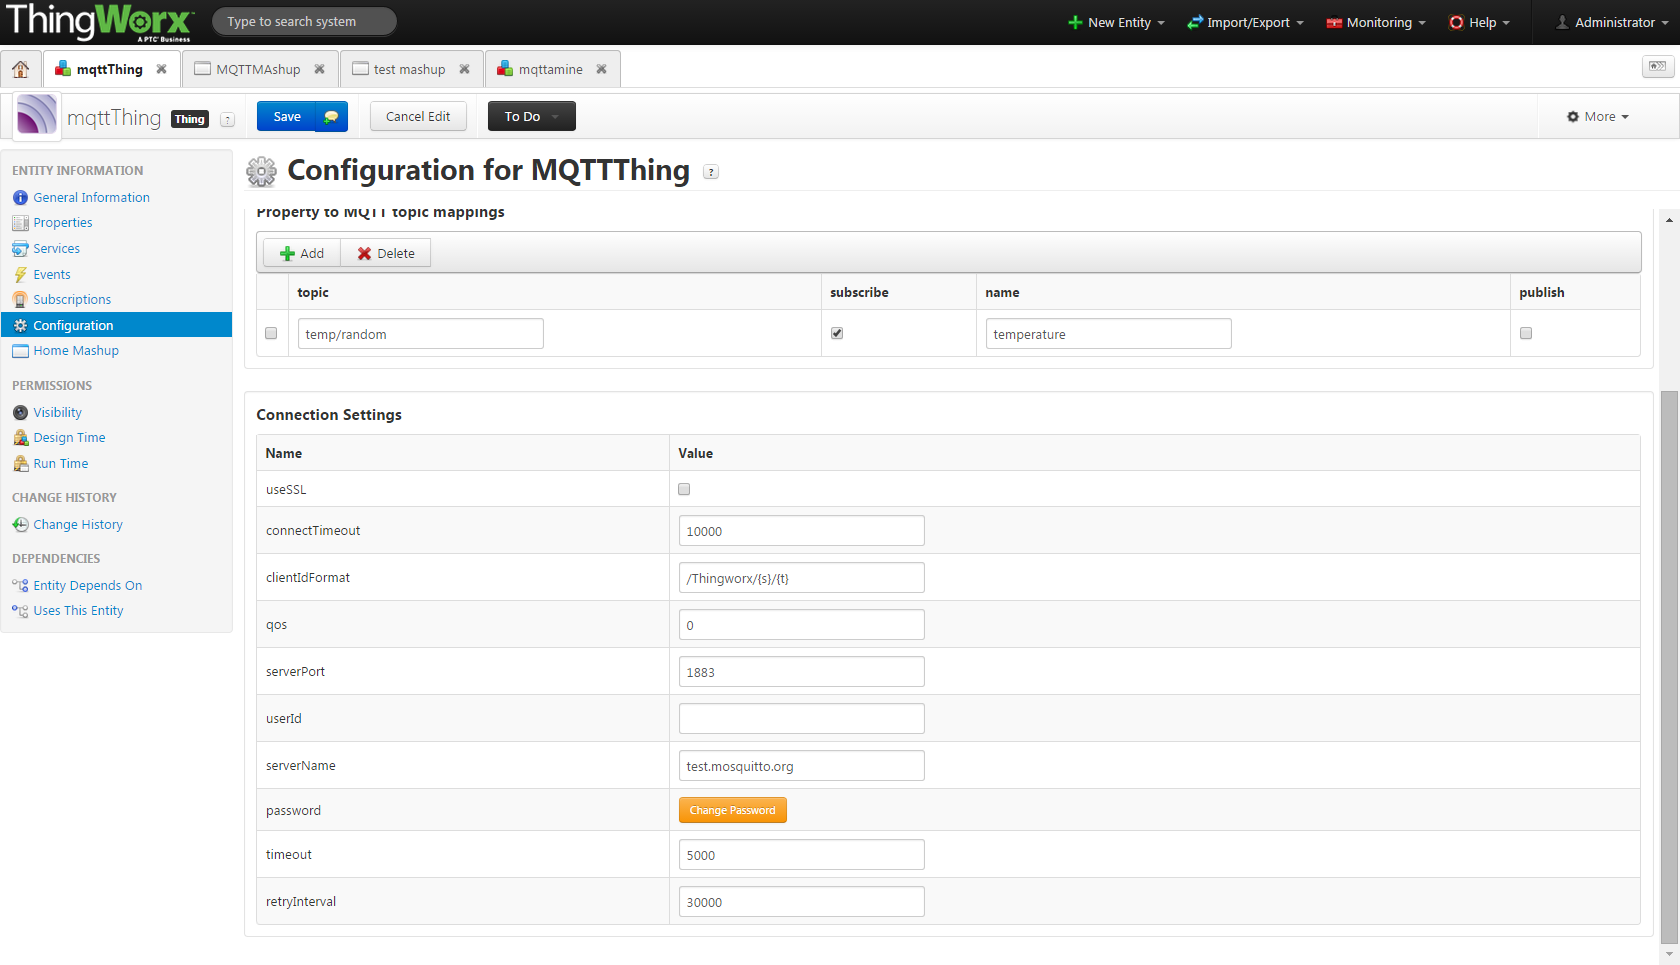 MQTT support in ThingWorx - PTC Community